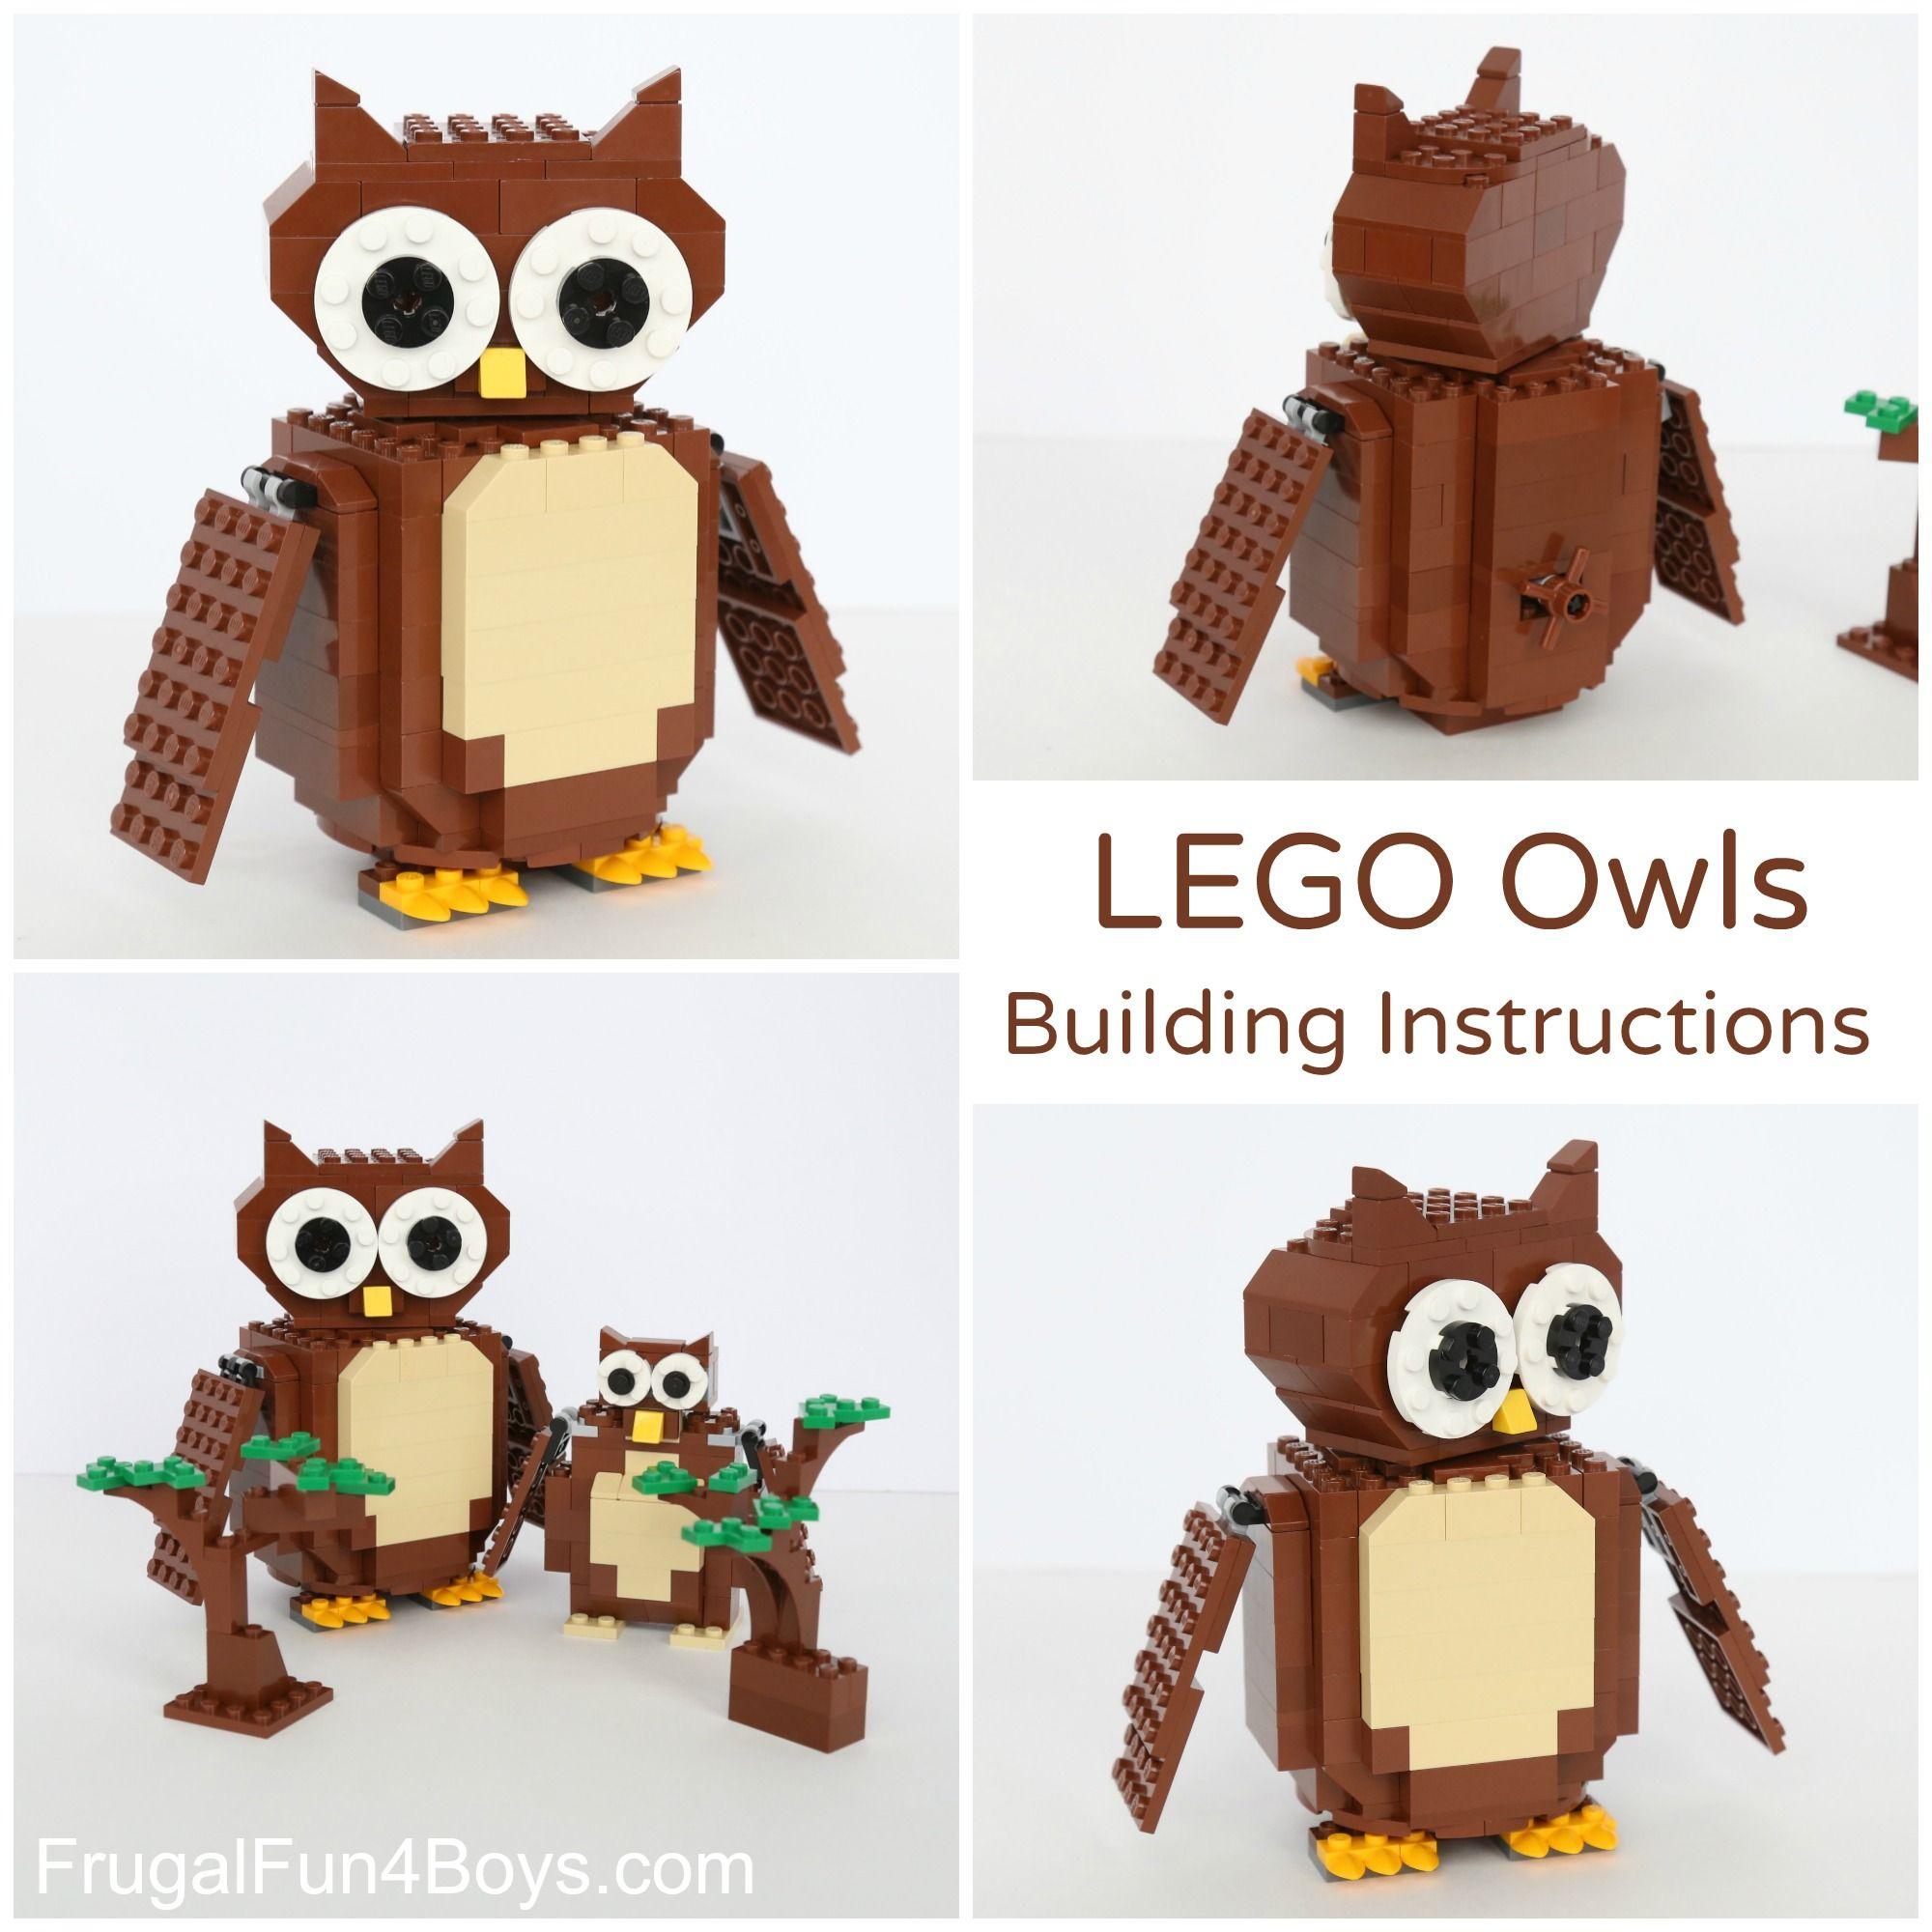 Lego Owl Building Instructions Toptoys Pinterest Lego Owl And